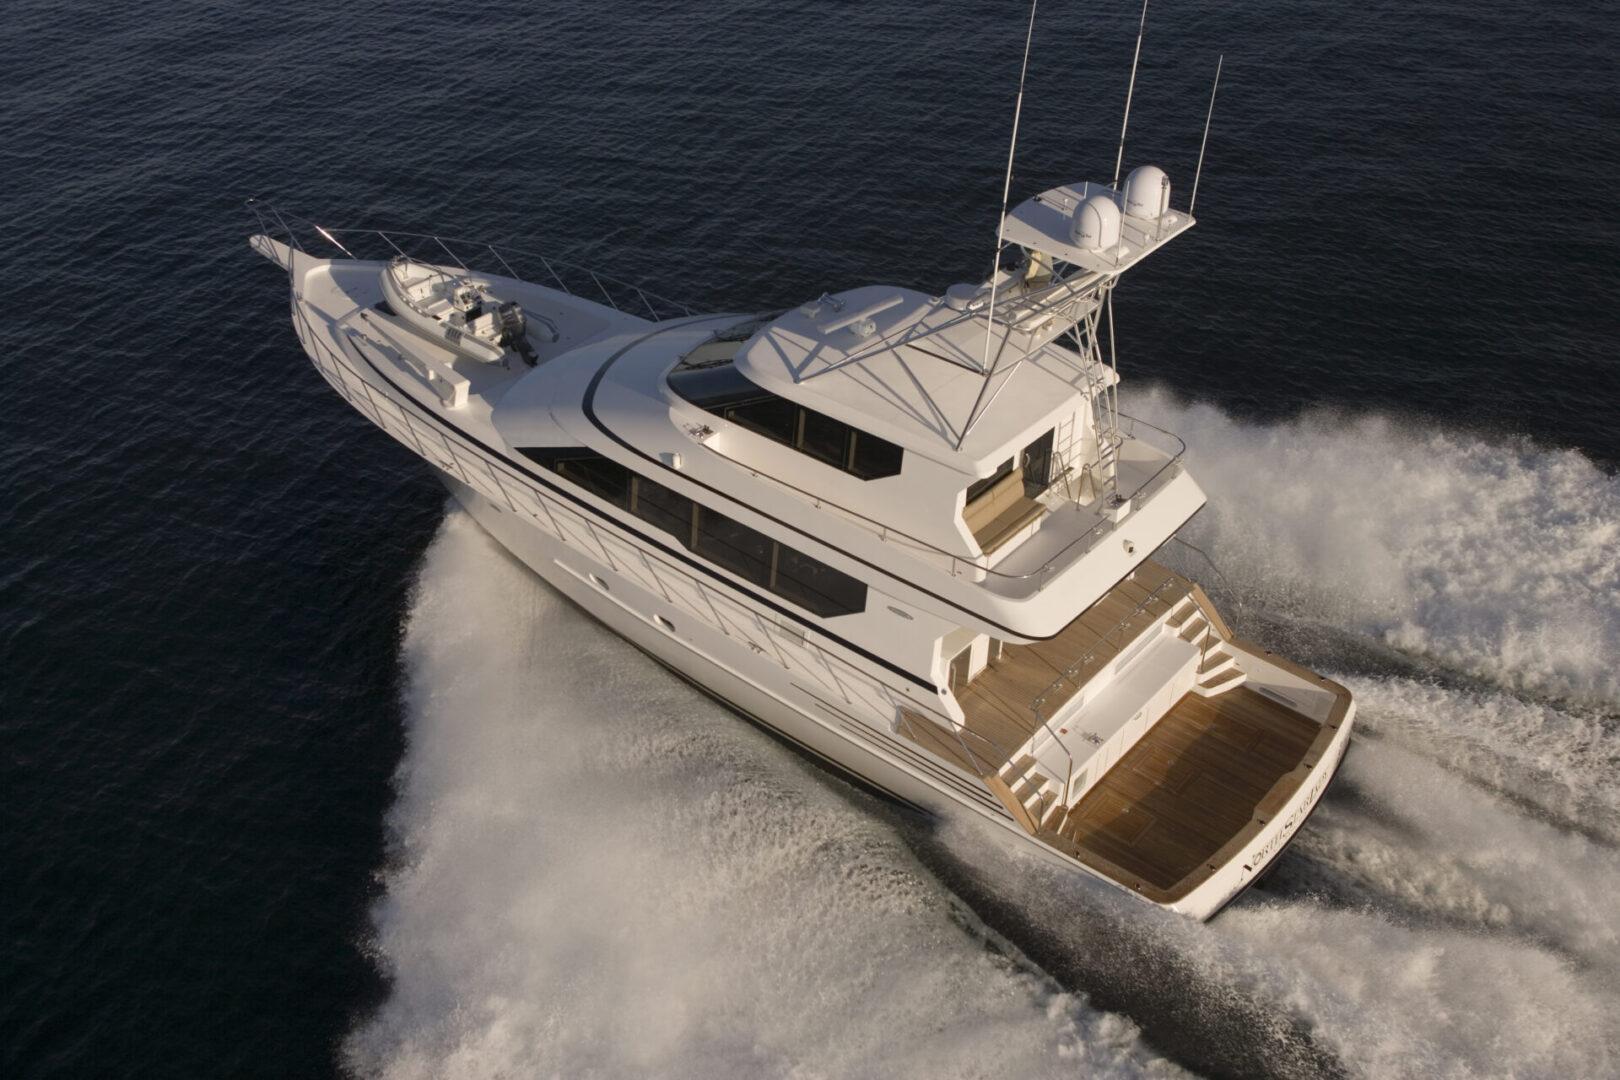 El Lobo Northstar 80' Sportfishing Boat